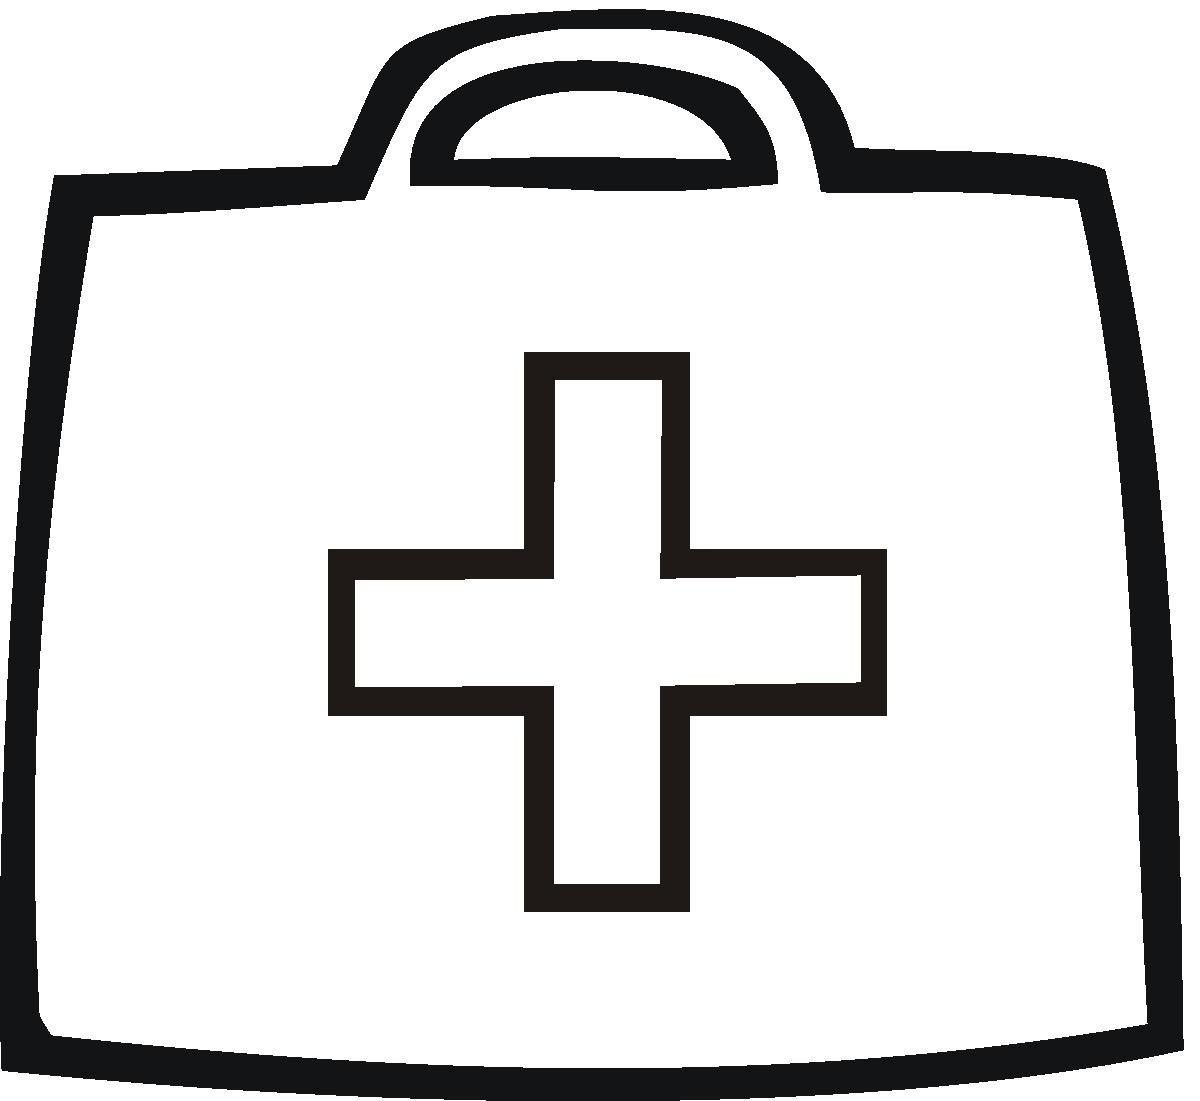 First Aid Clipart